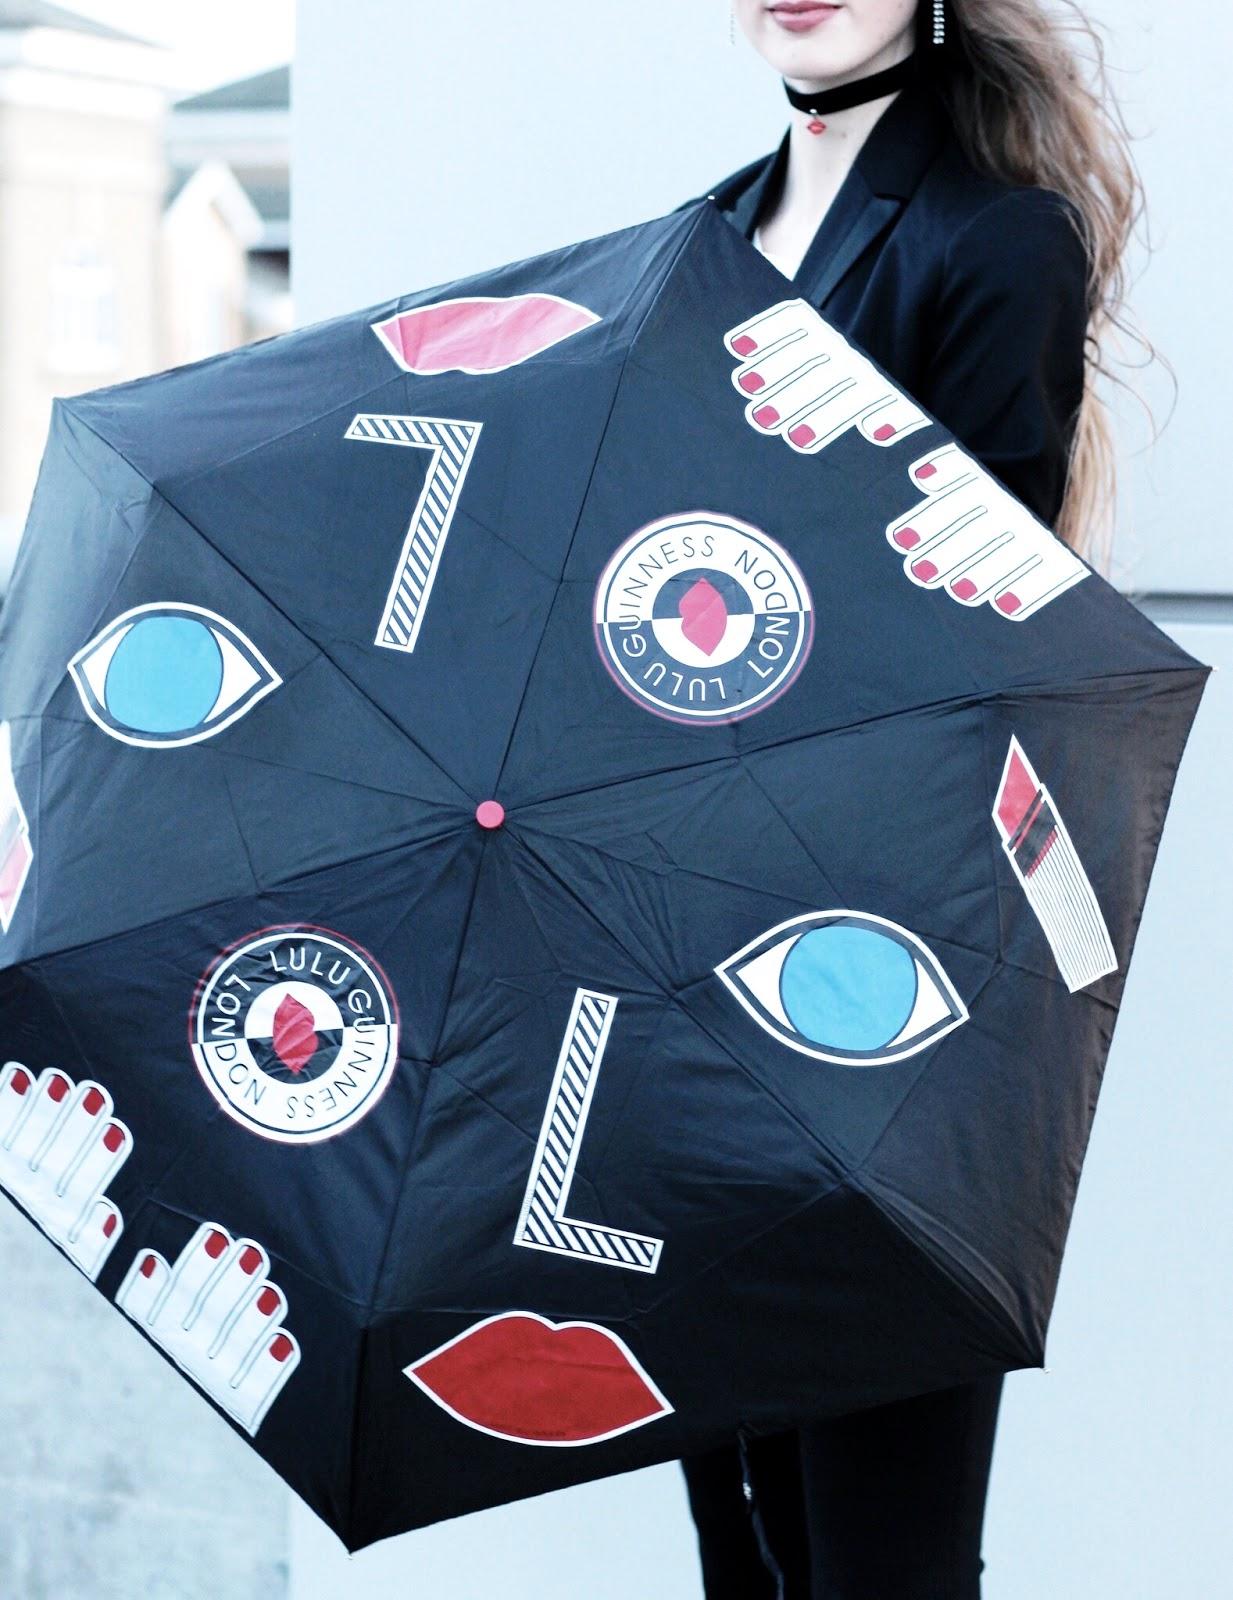 Fulton Lulu Guinness Stickers Umbrella